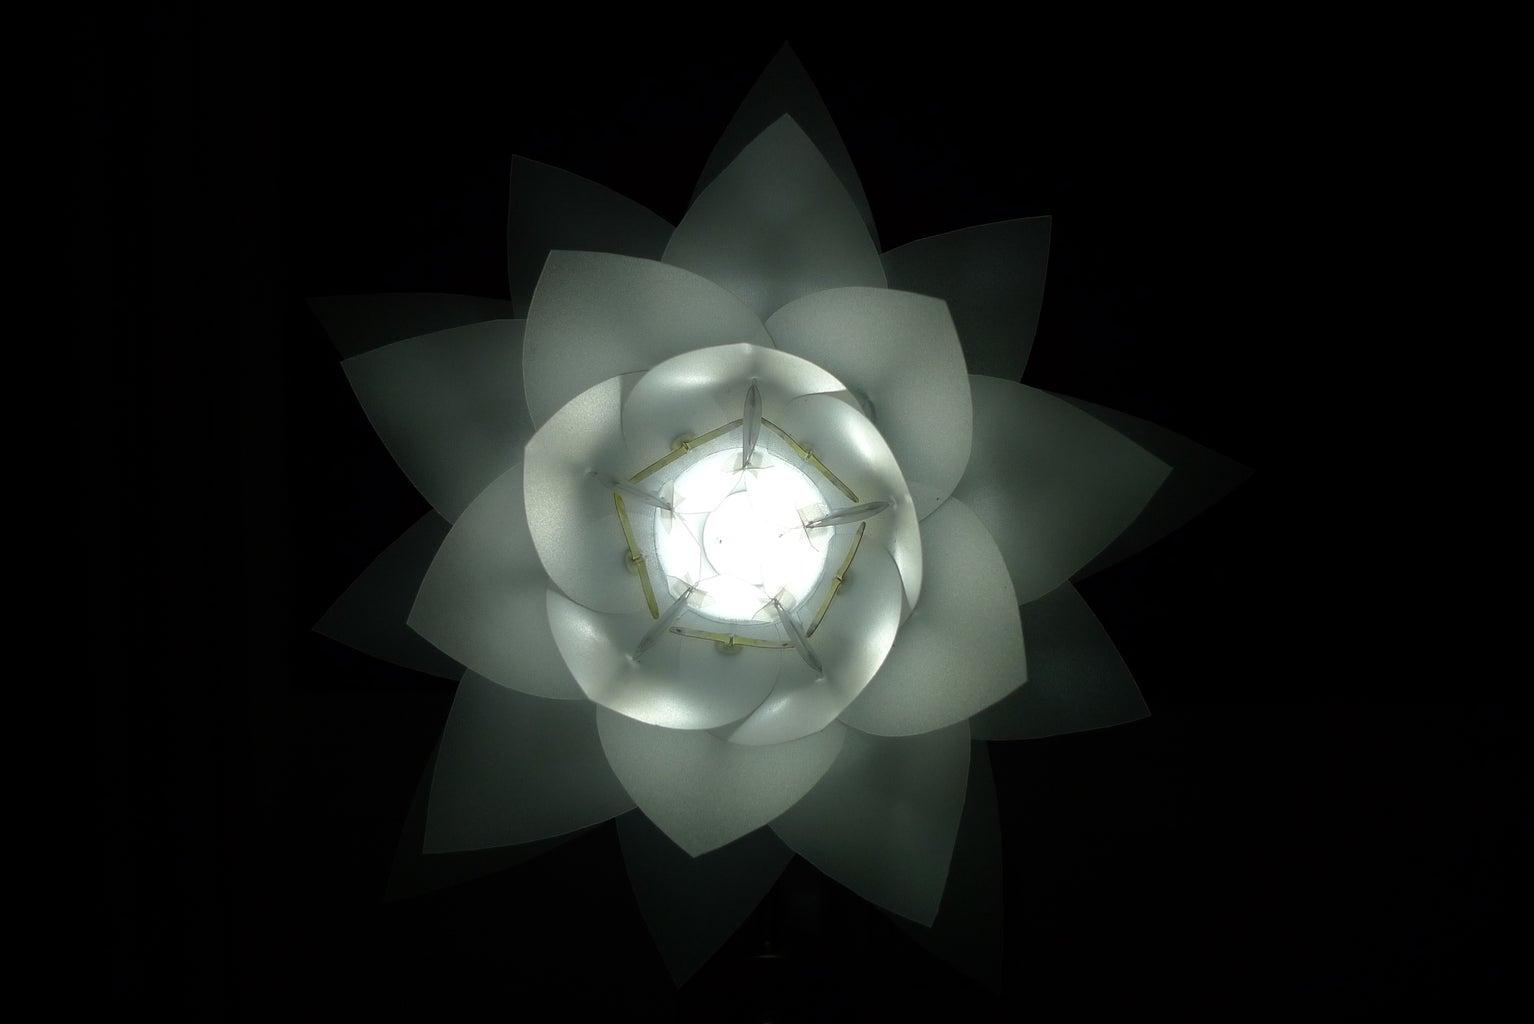 The DIY Artichoke Lamp